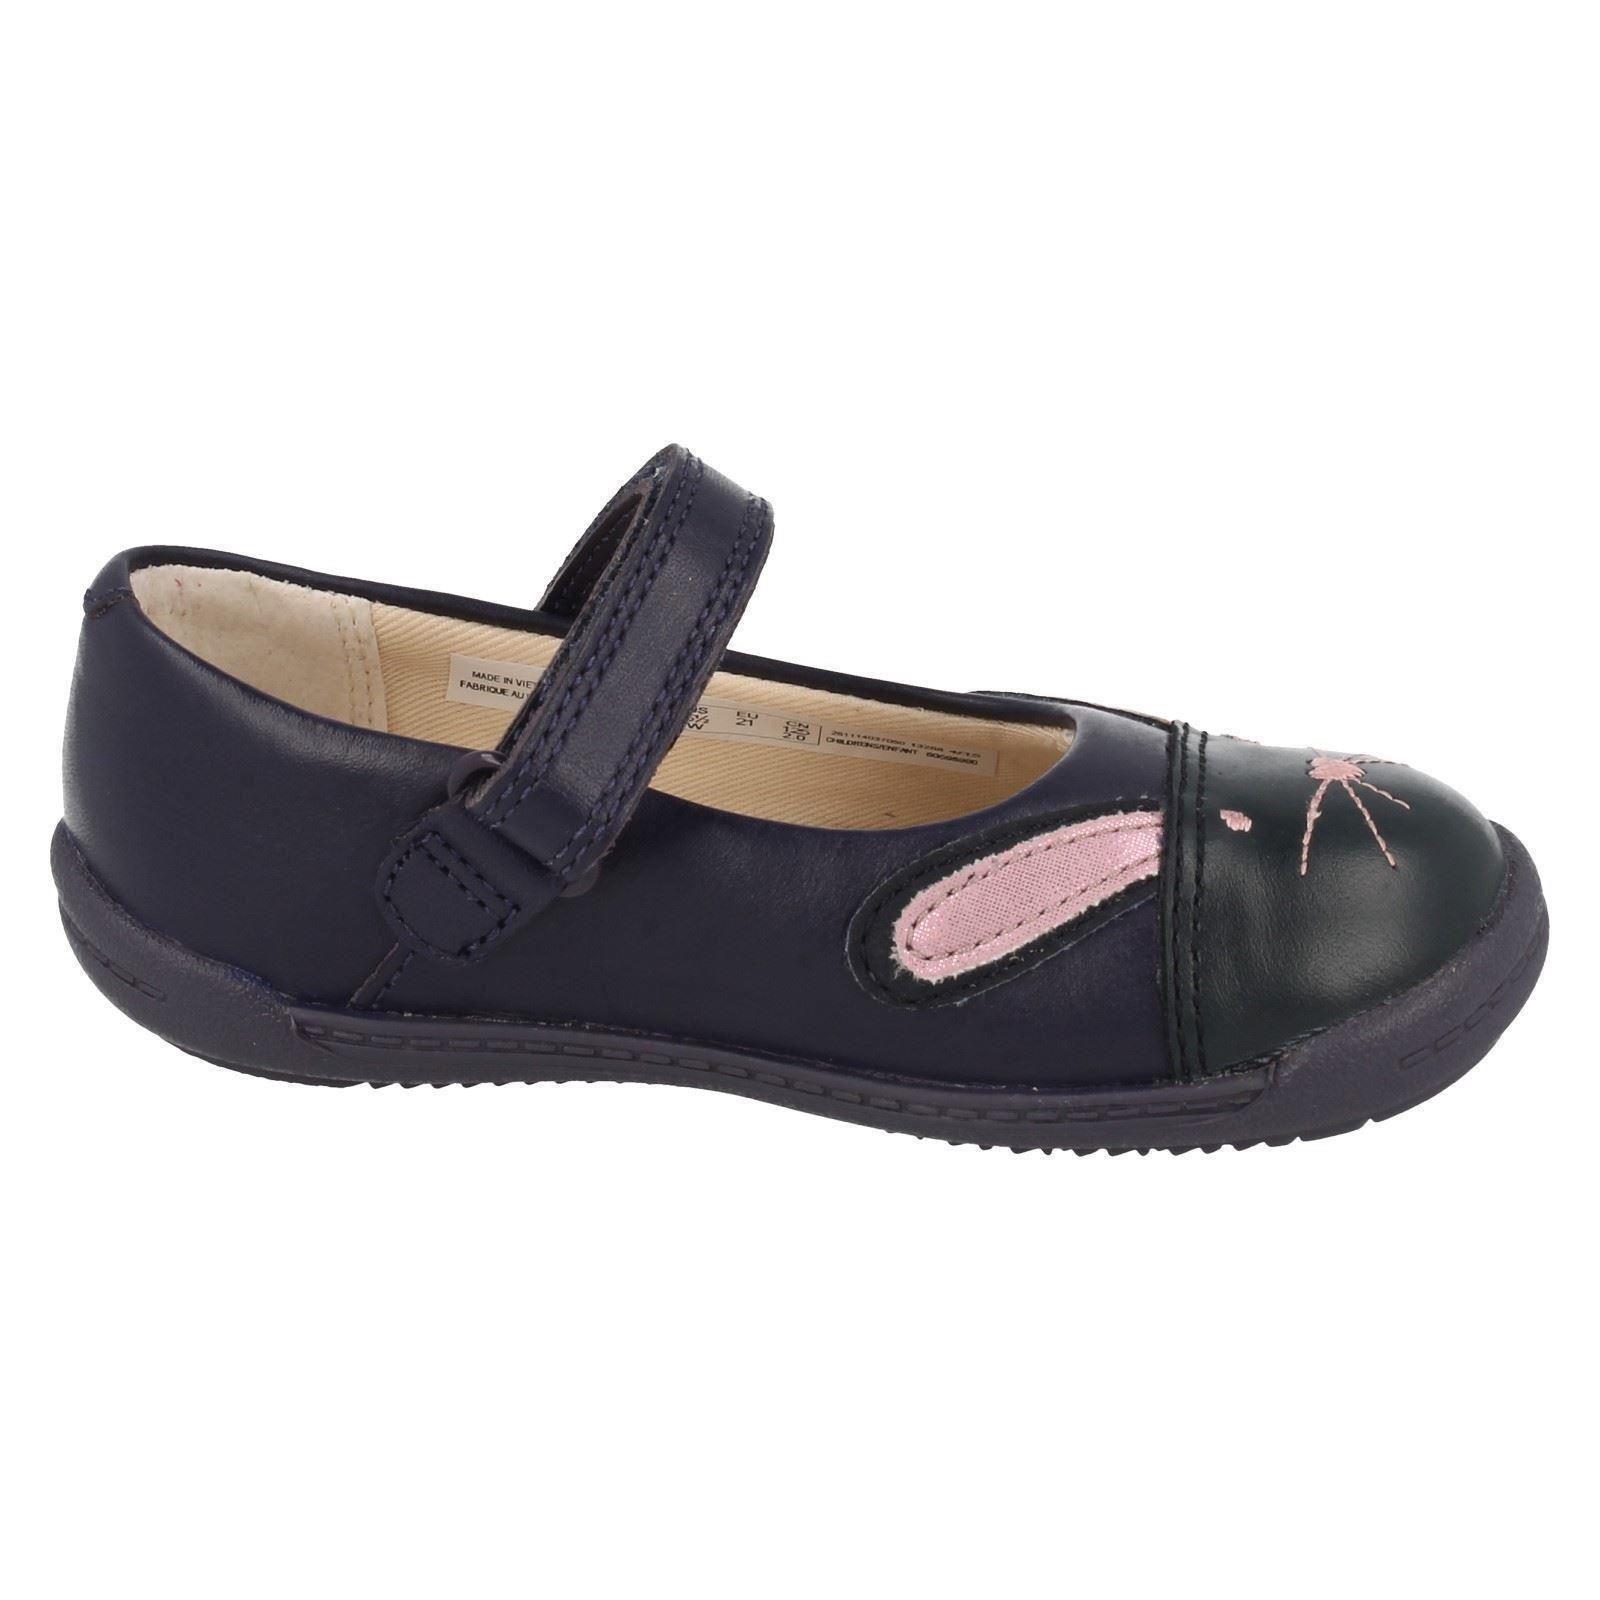 Bunny' Niñas zapatos Primeros marino 'iva azul azul Clarks Iawa7qCZ